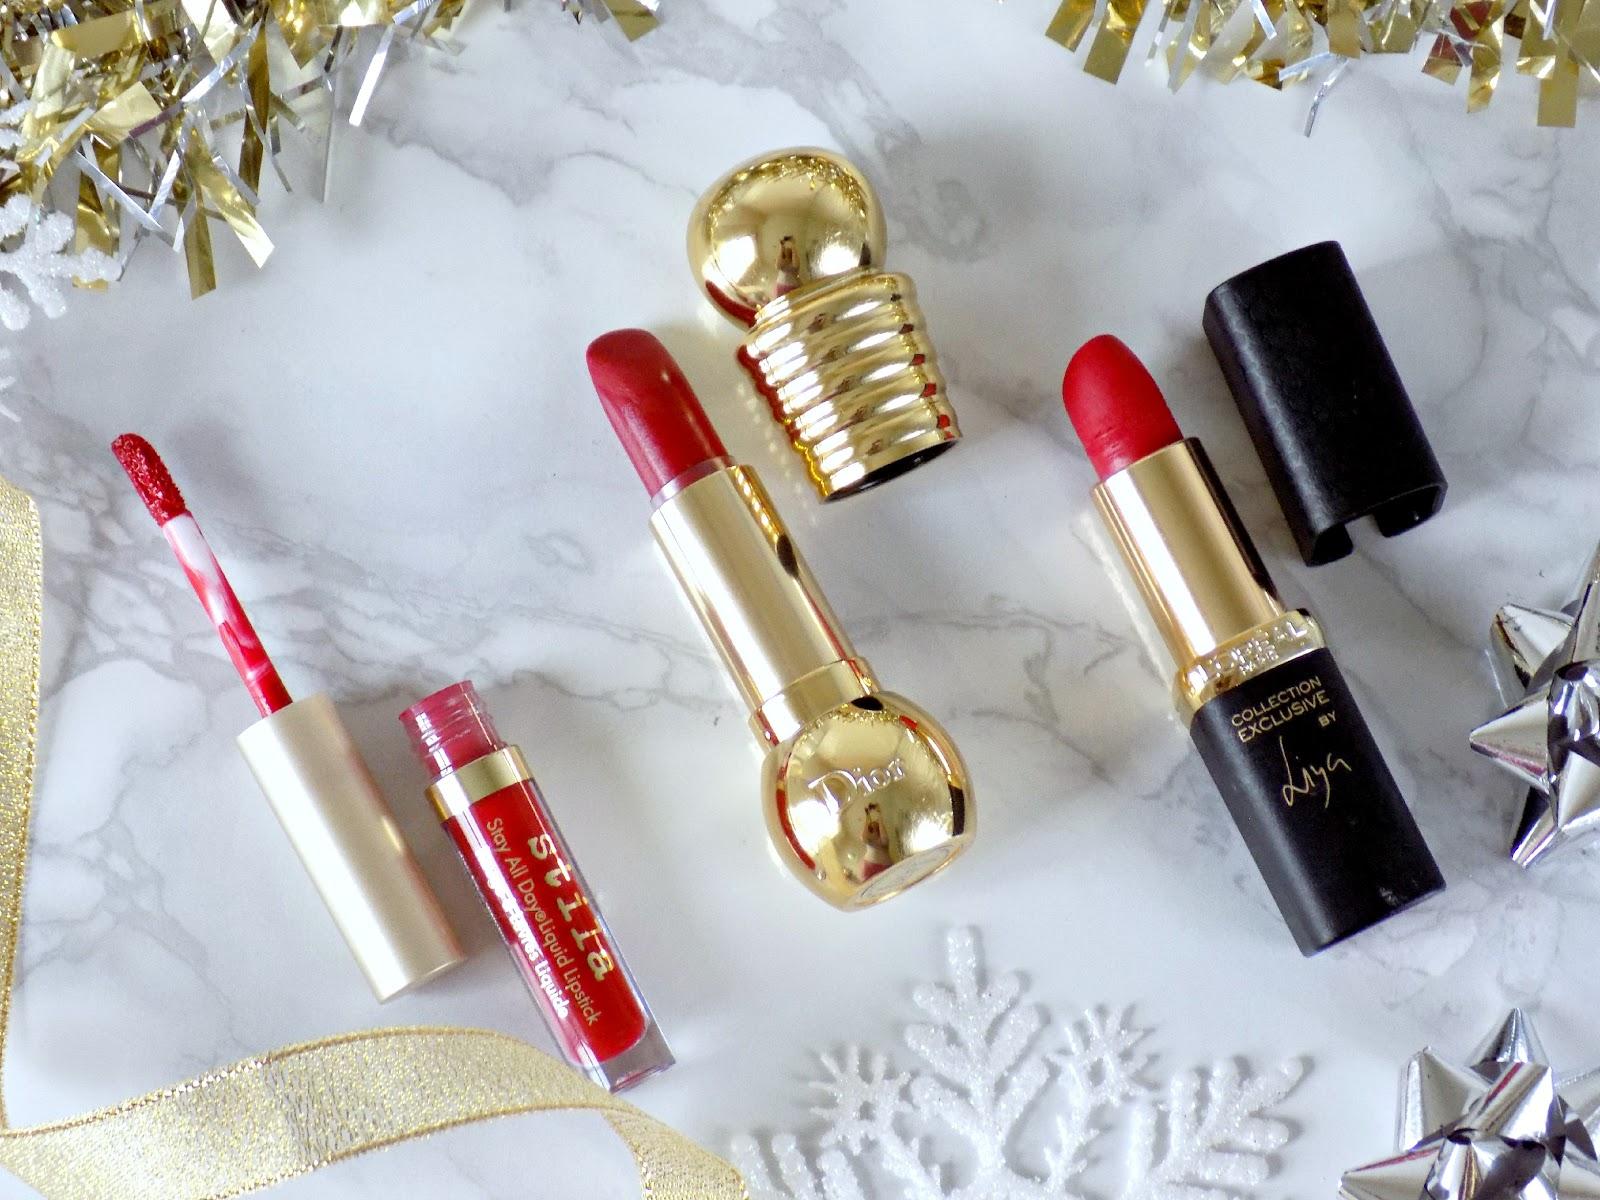 Festive red lipsticks